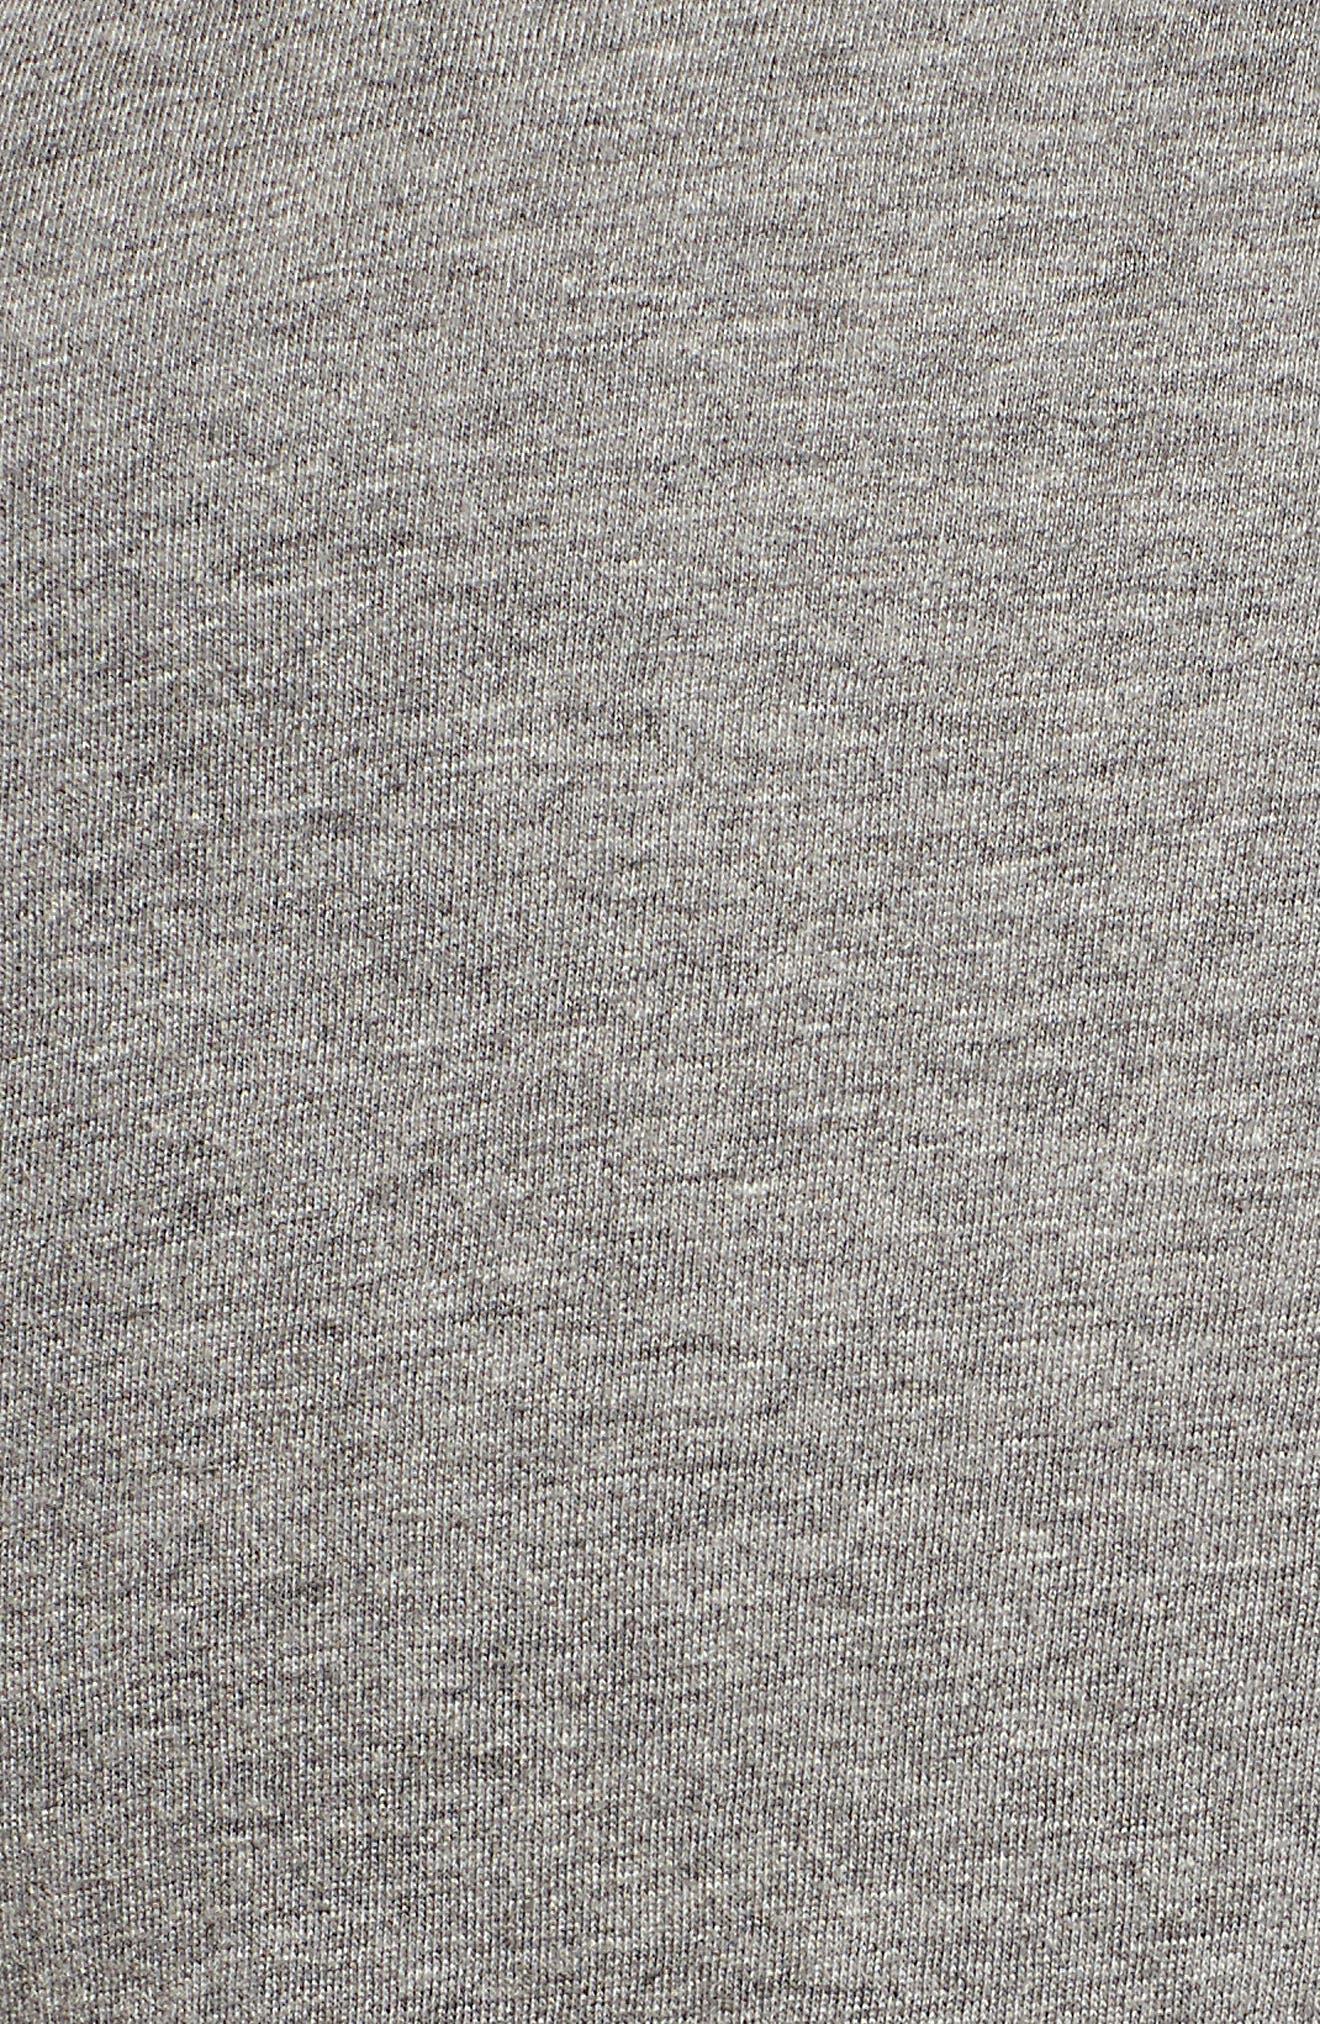 San Francisco Giants Fader Letter Tee,                             Alternate thumbnail 6, color,                             Slate Grey